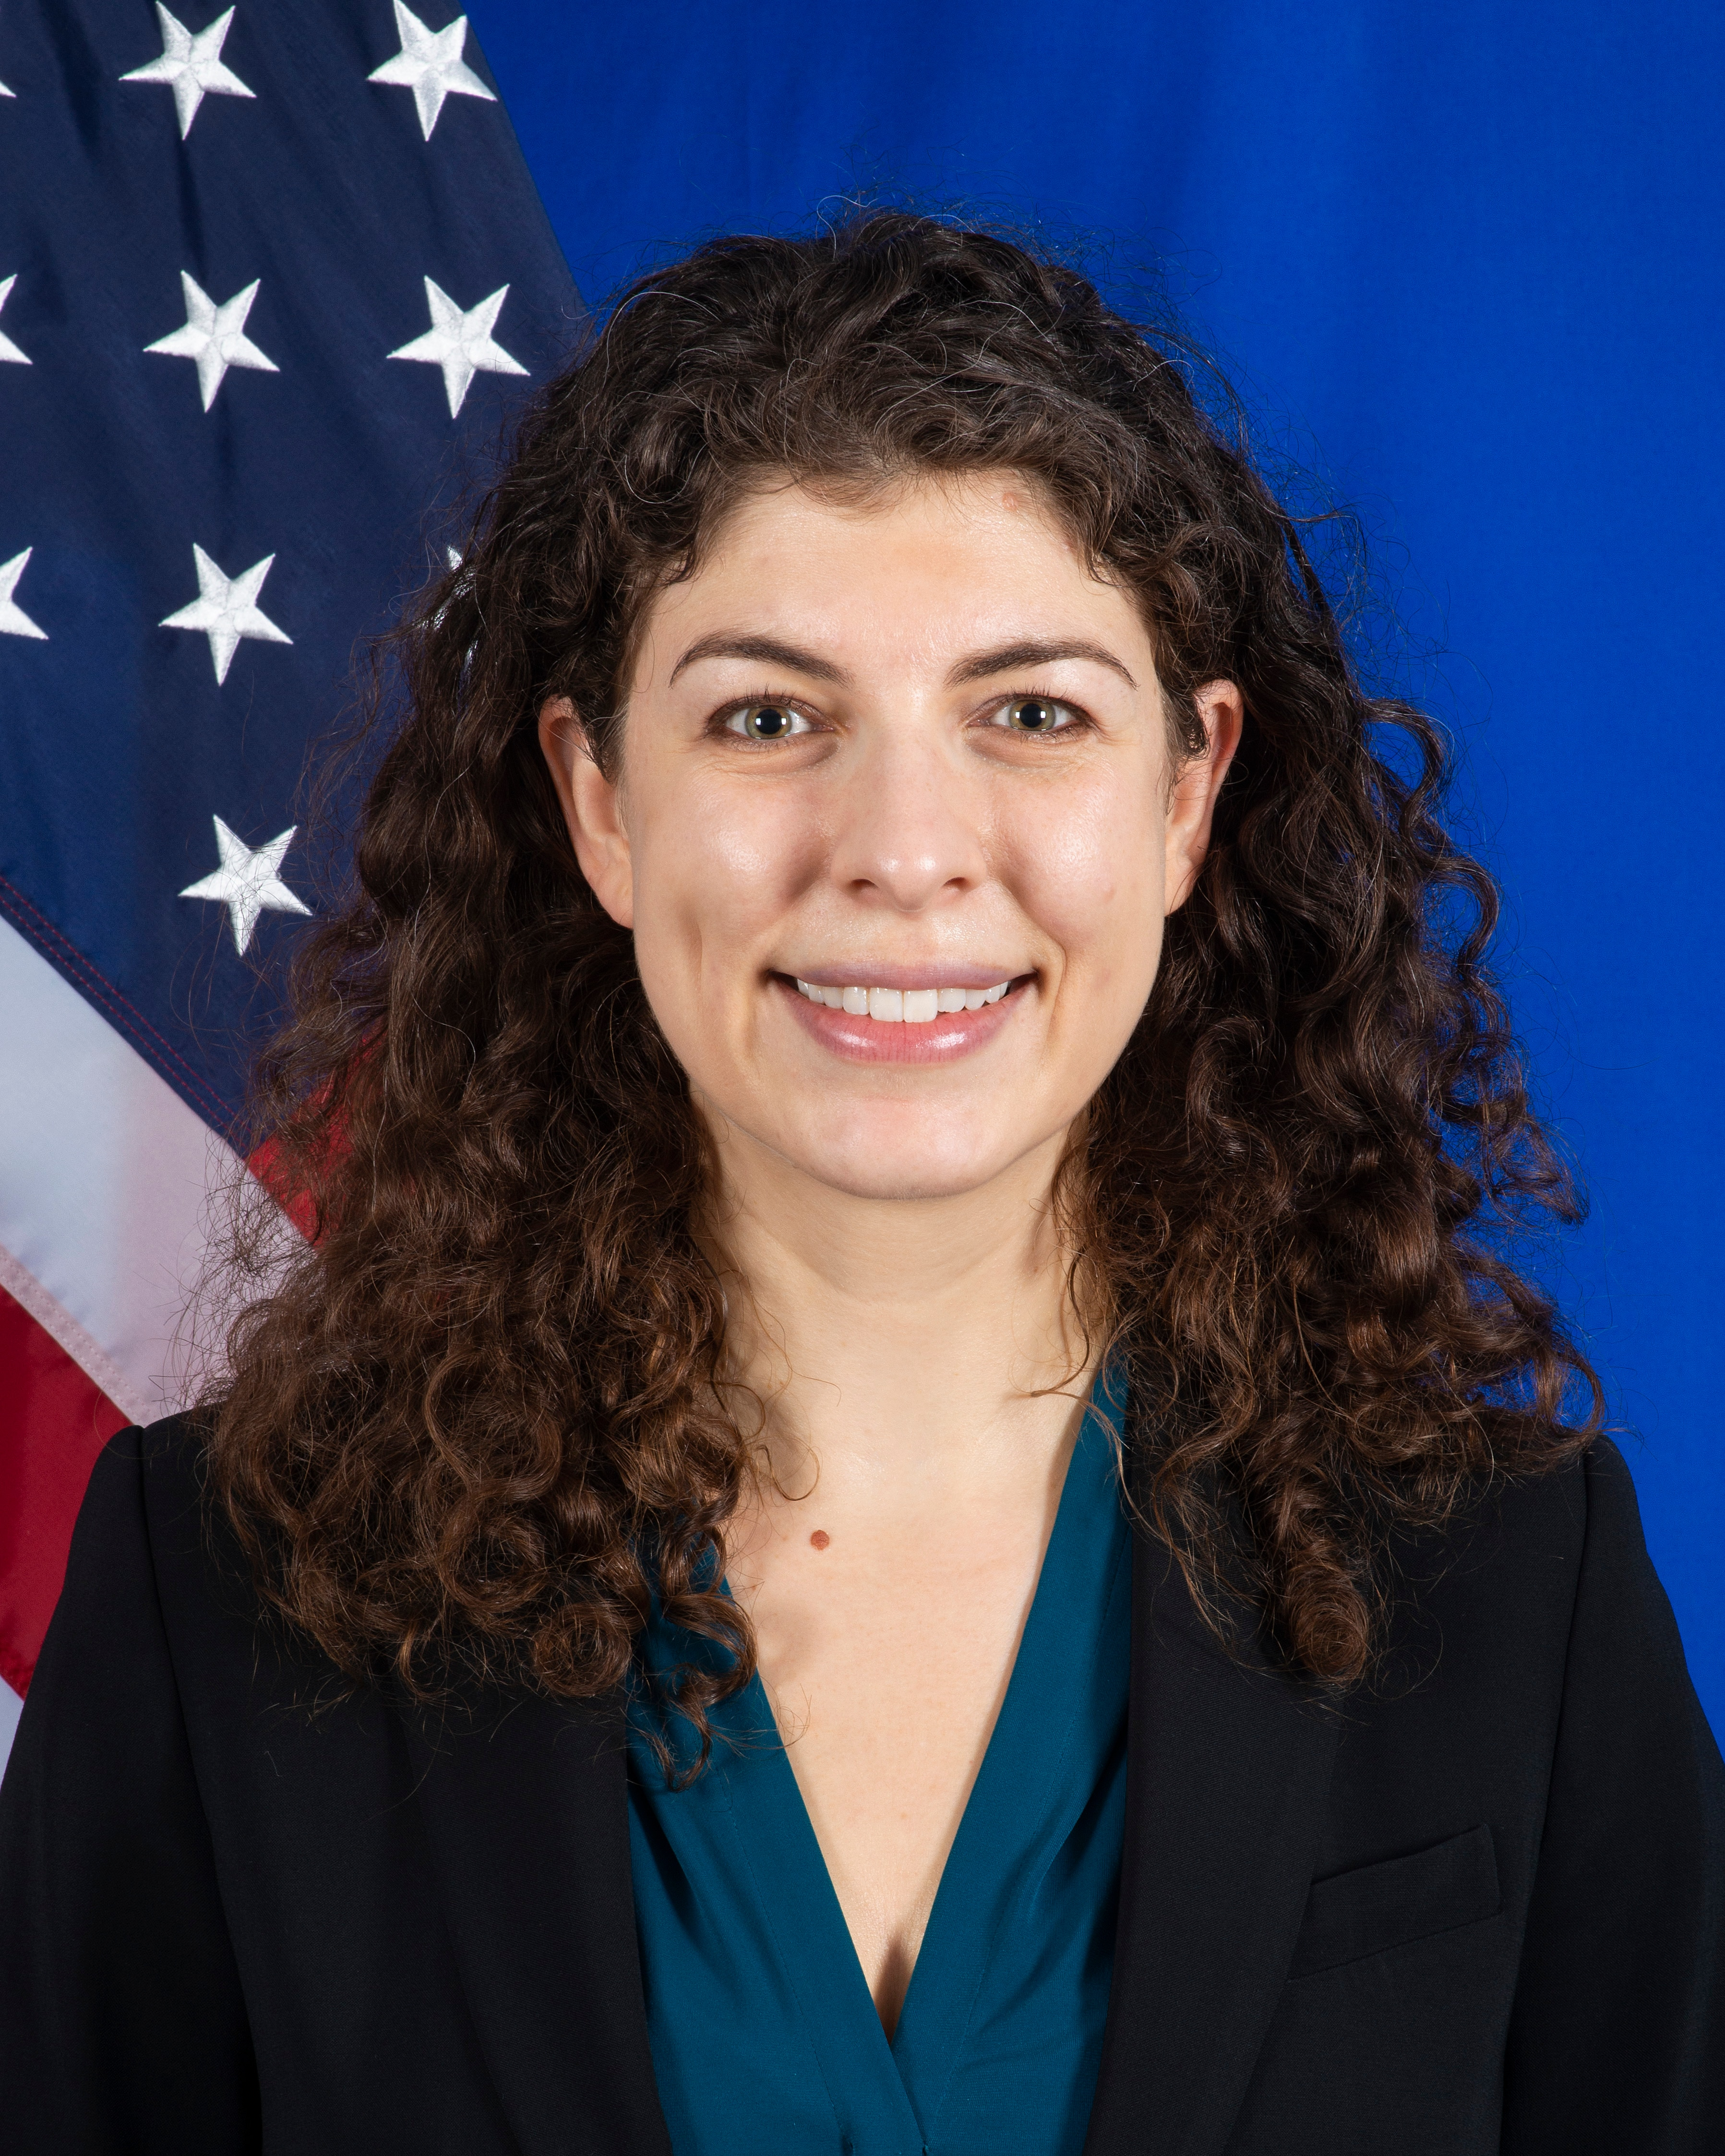 Allison Schwier 8×10 Official Portrait